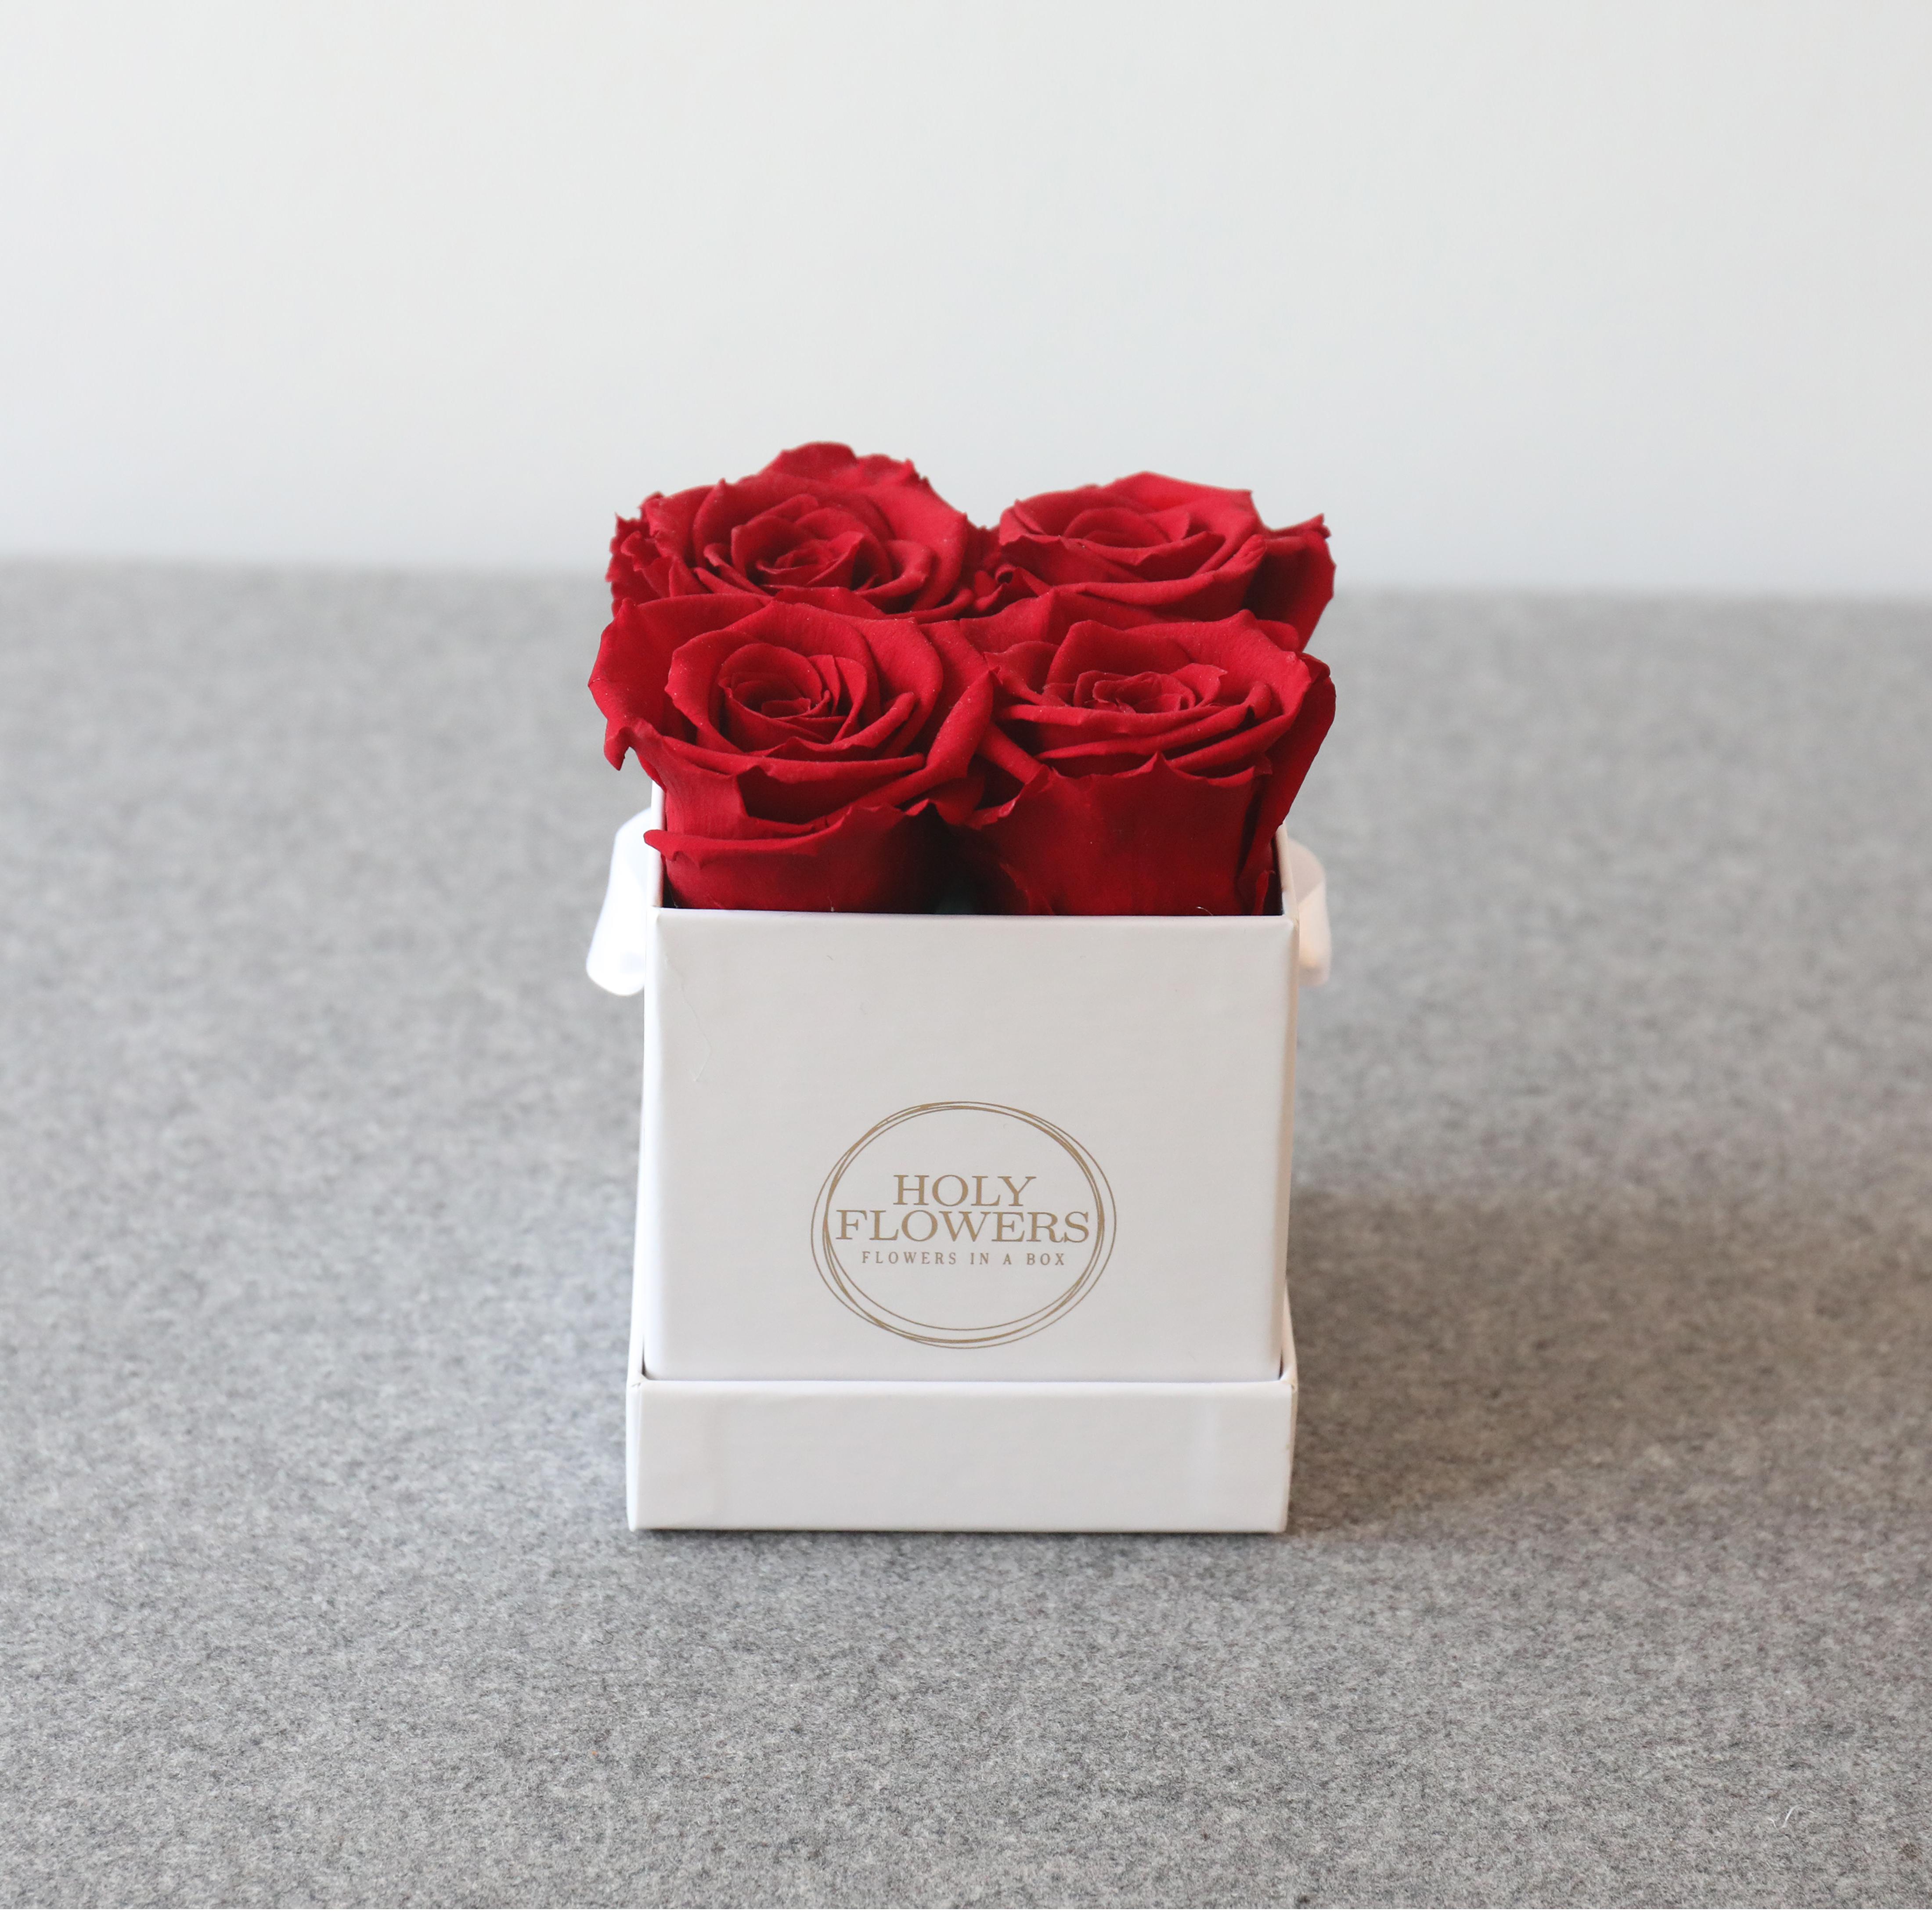 valentinstag besonderer anlass blumenboxen holy flowers rosen in der box exklusive. Black Bedroom Furniture Sets. Home Design Ideas